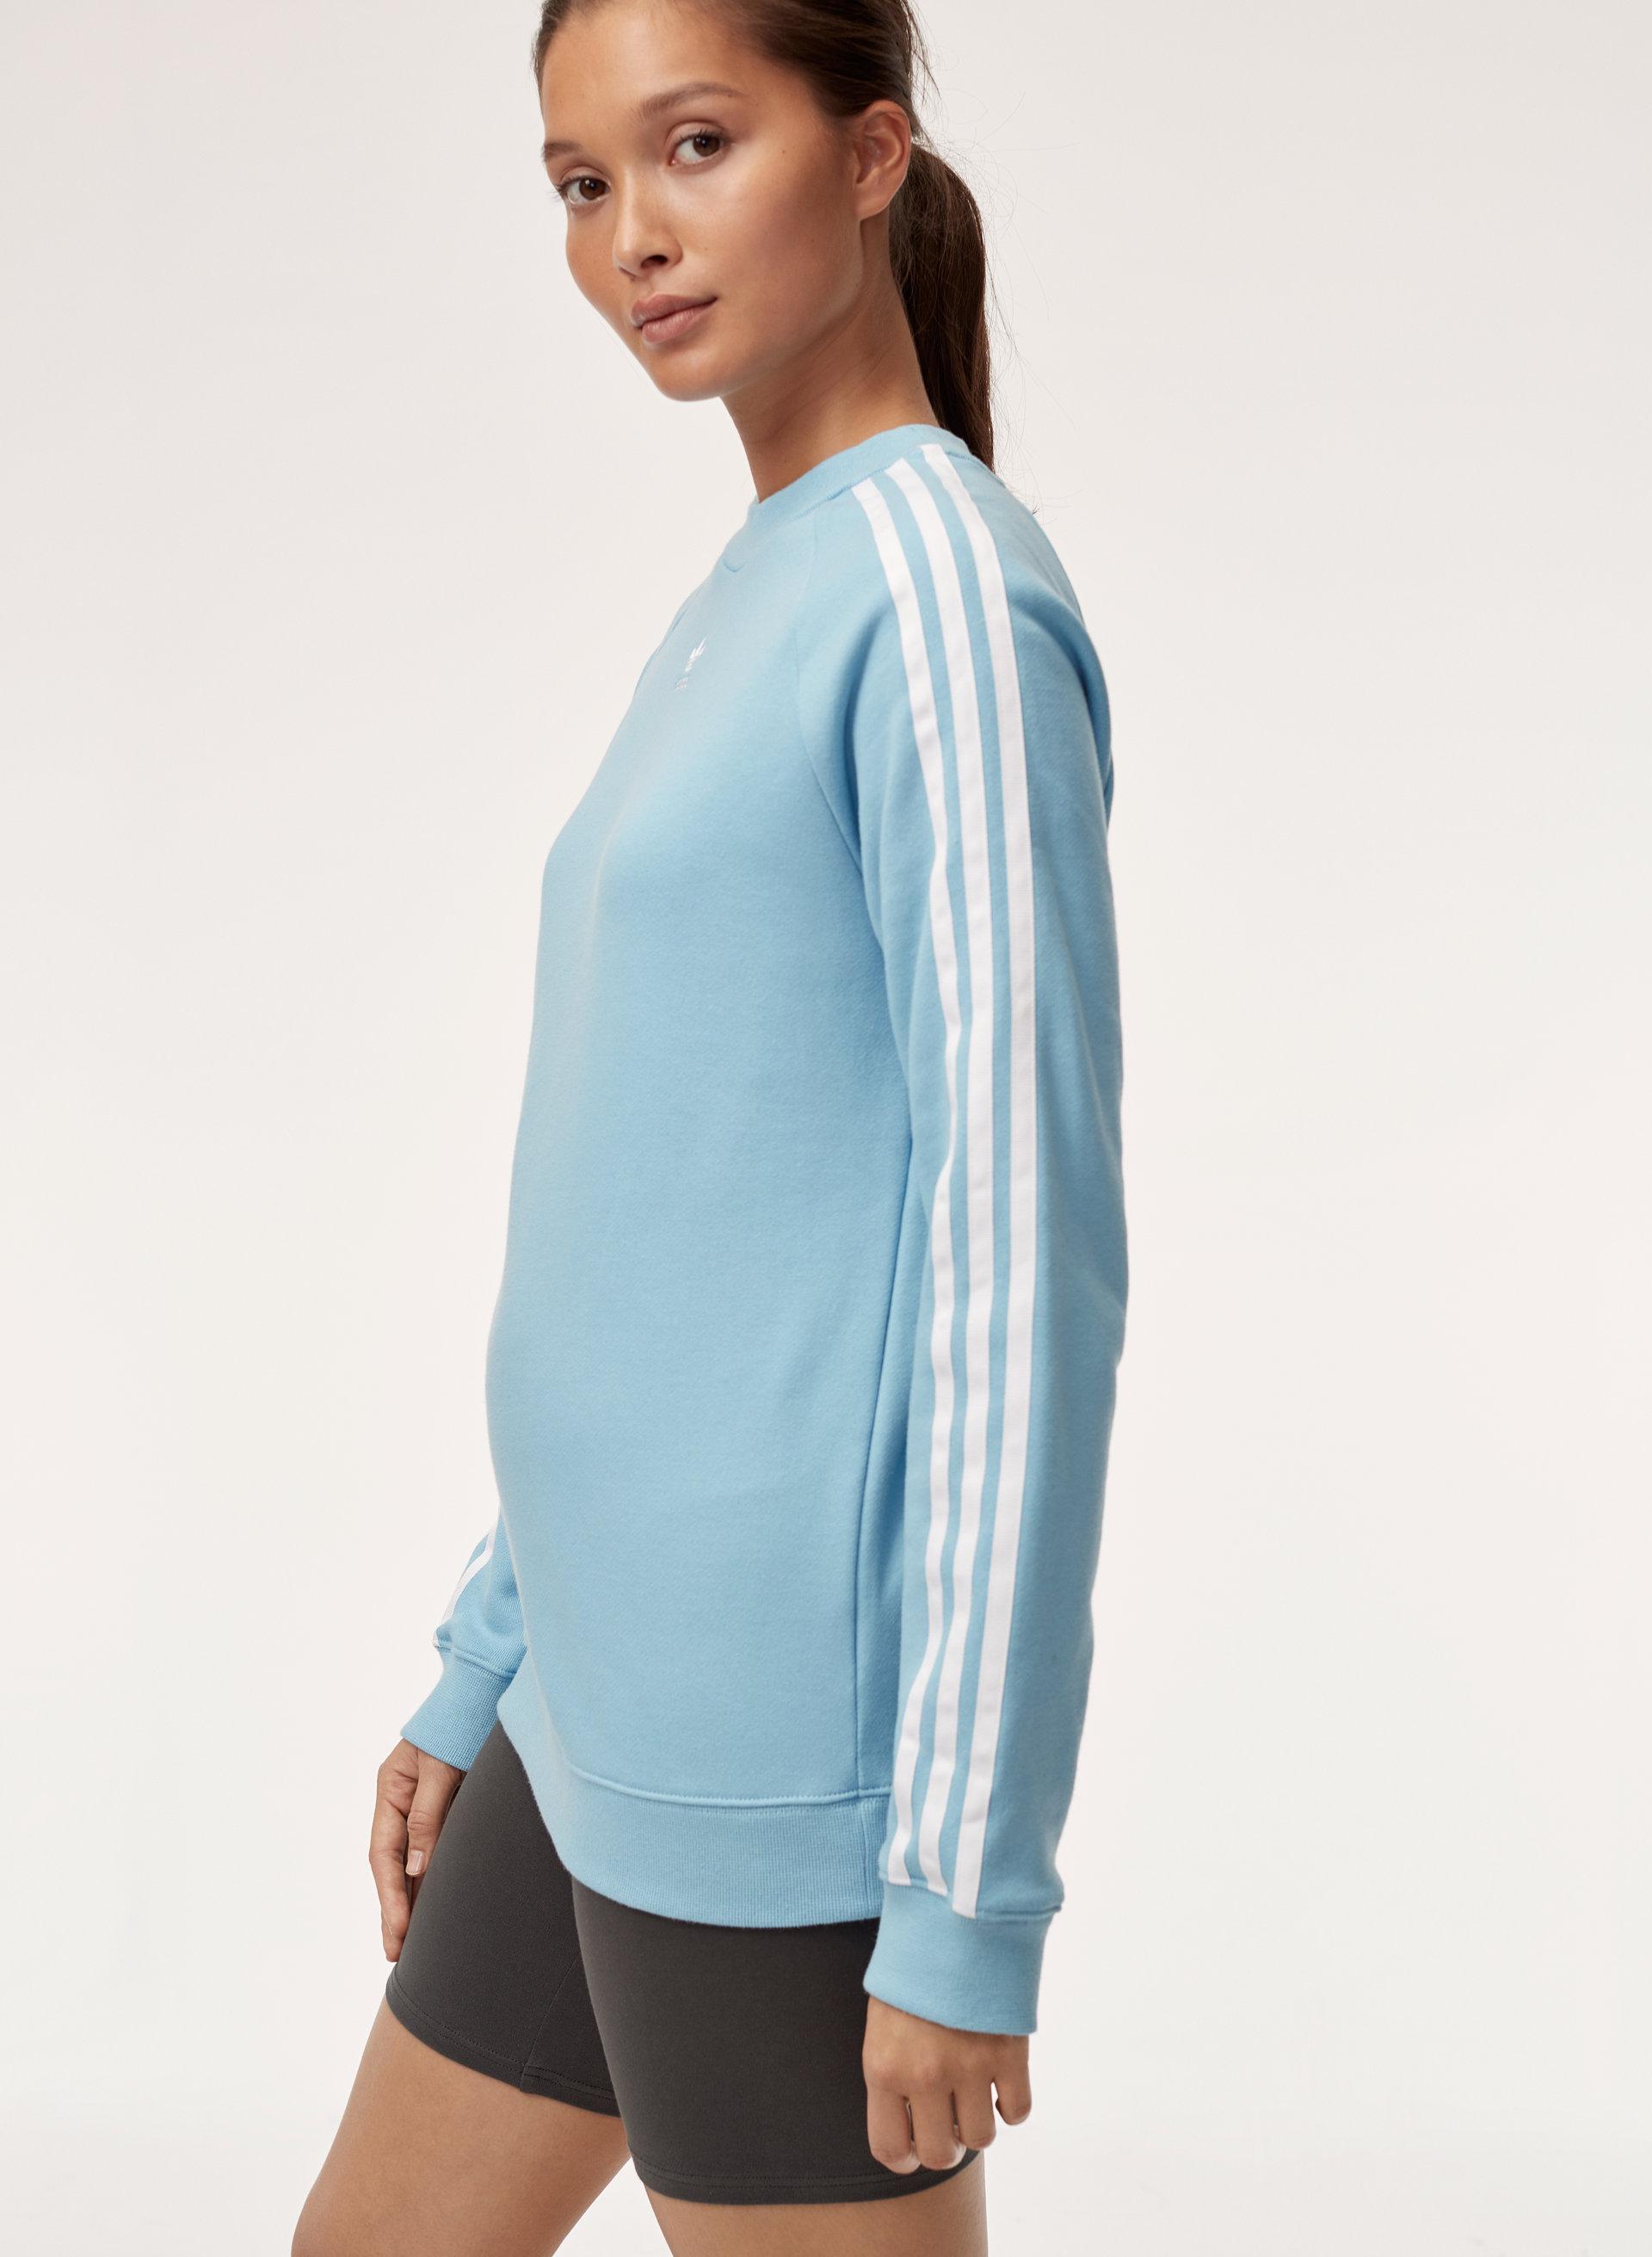 2c083e6b6 TRF CREW SWEATER - 3-stripe crewneck sweatshirt